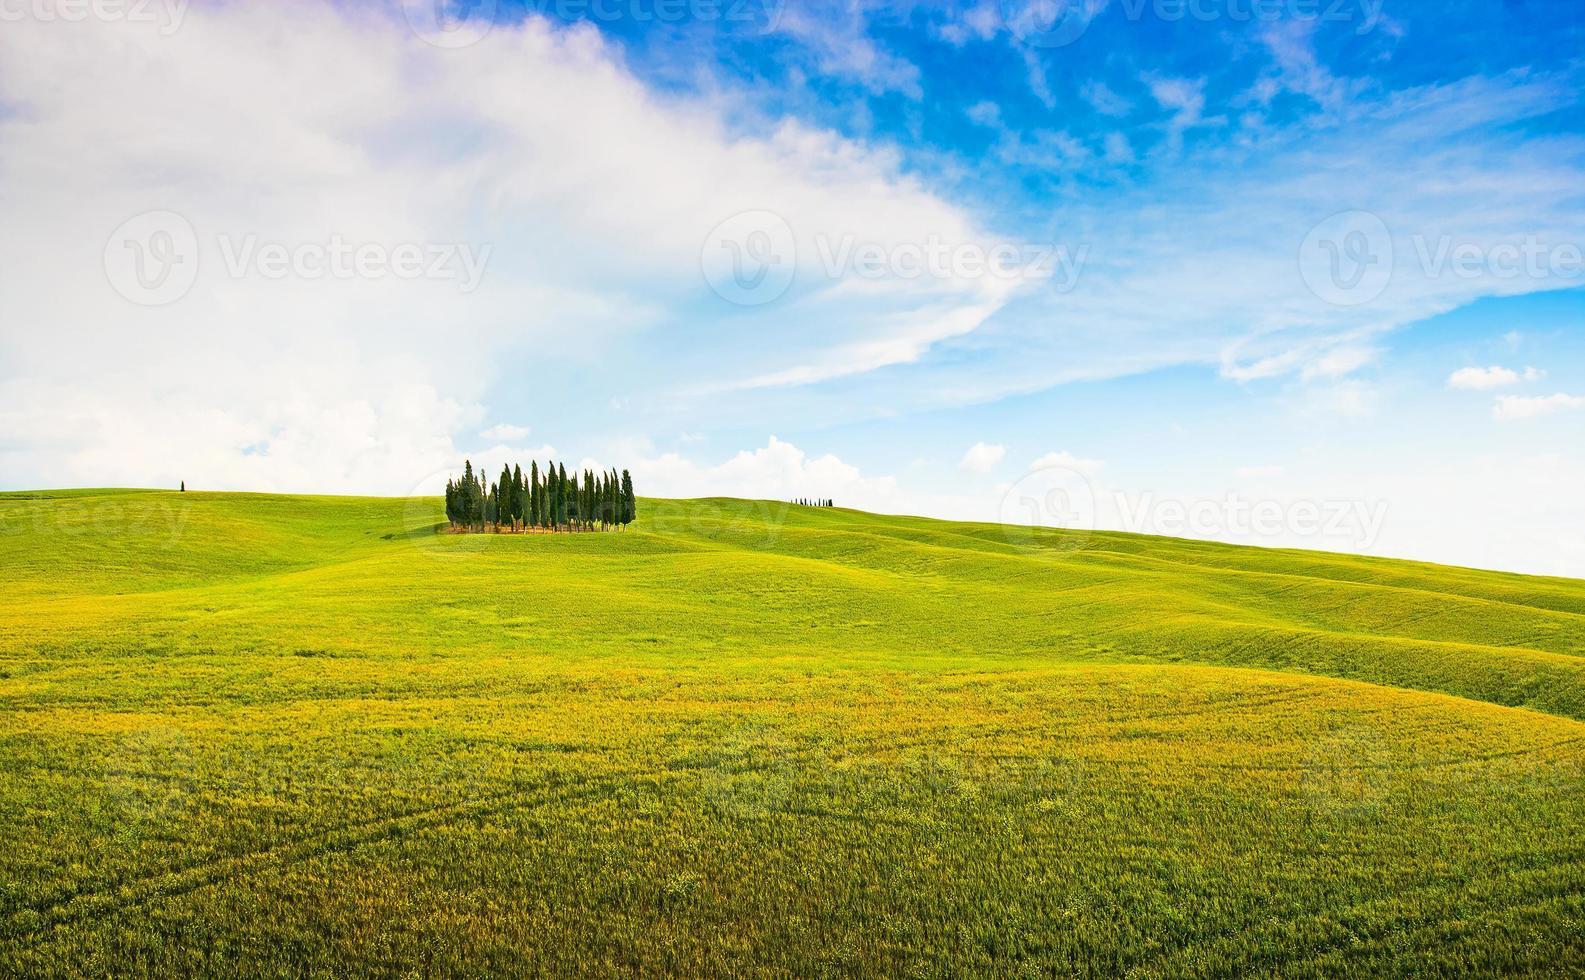 pintoresco paisaje toscano en val d'orcia, italia foto